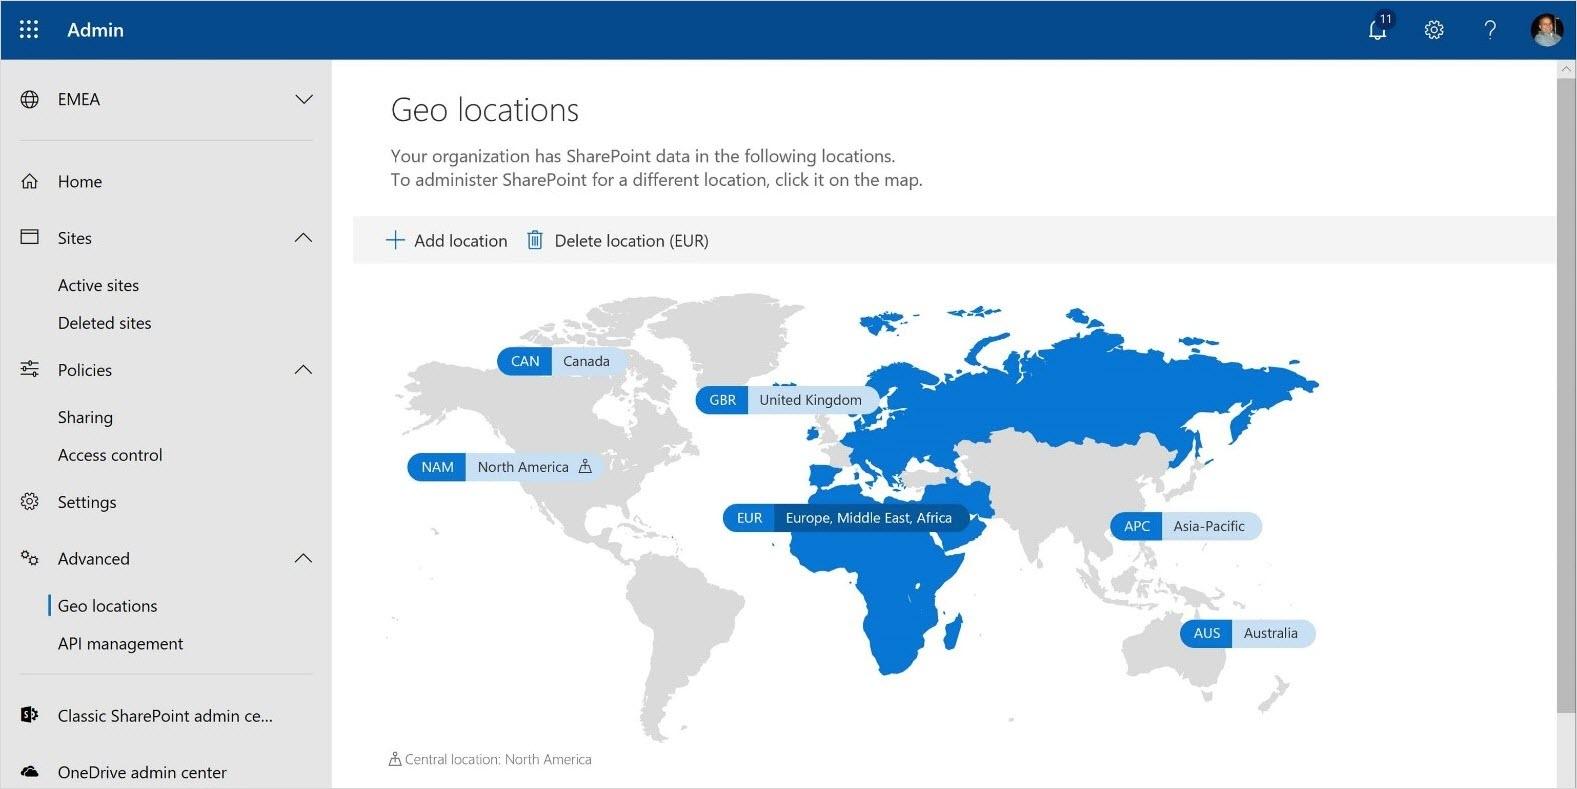 Image shows Multi-Geo capabilities in Office 365.